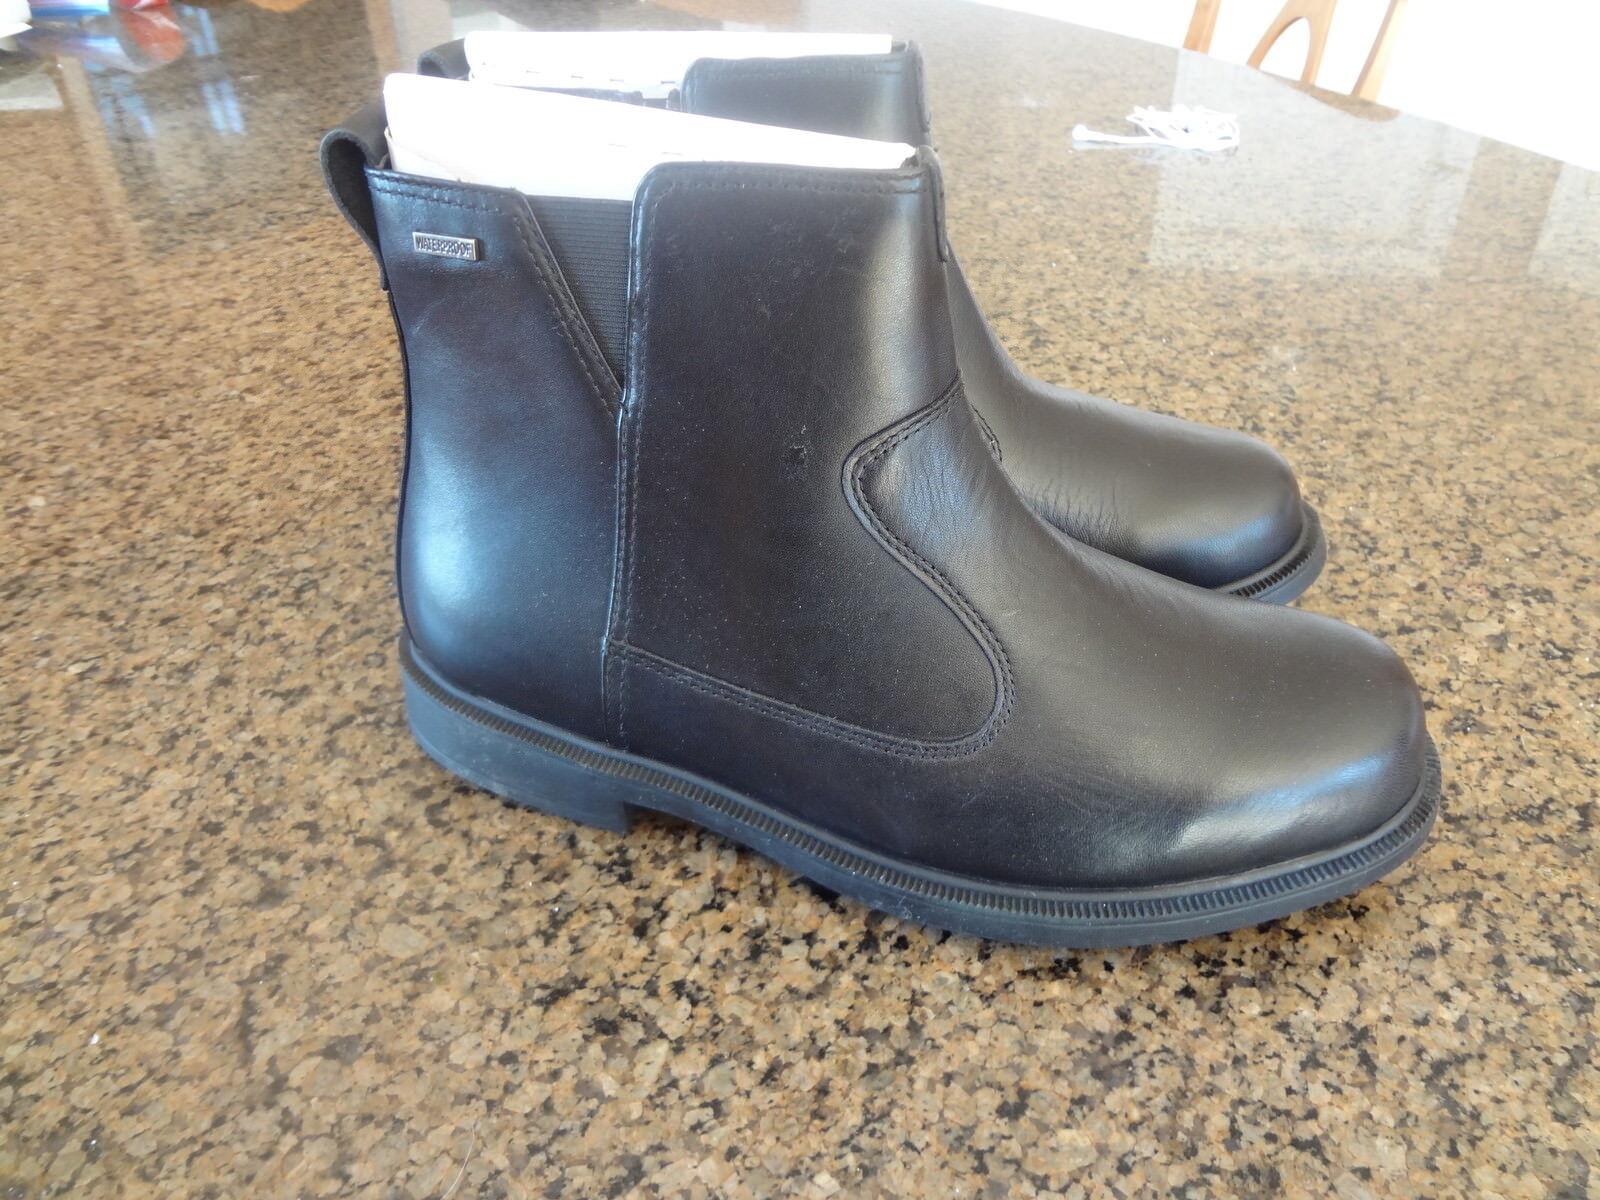 NEW Dunham Men's Size 9.4E Black James-Dun Chelsea Boots